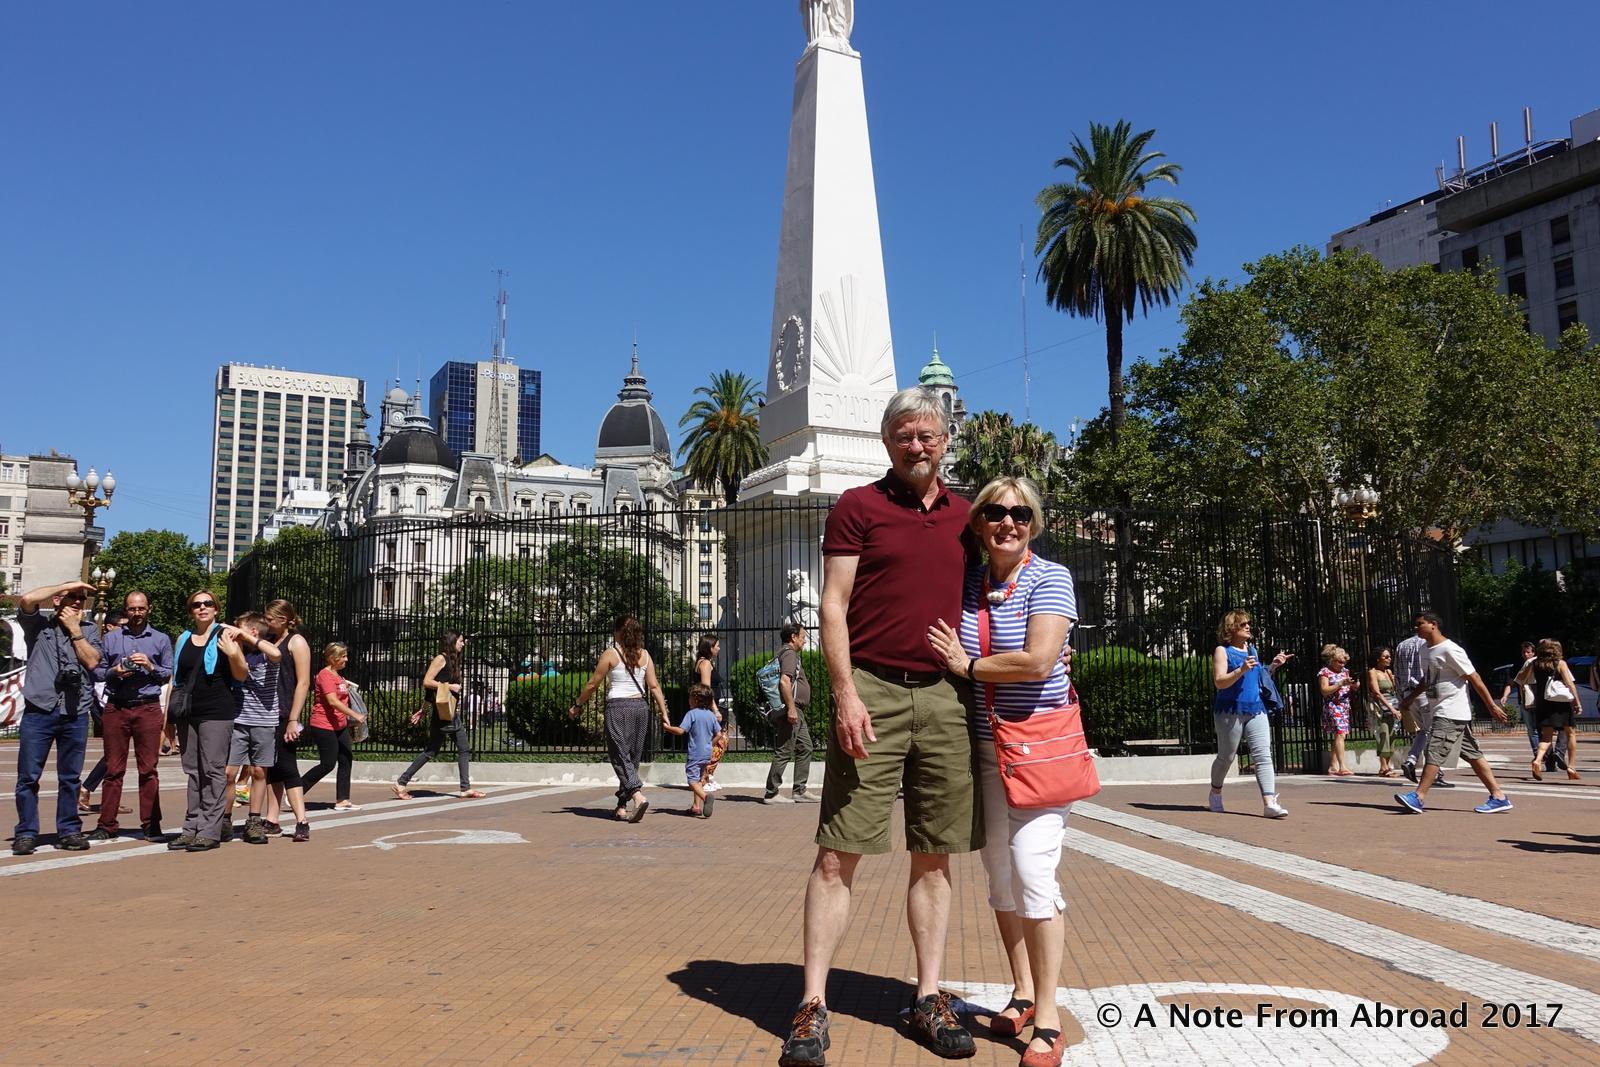 Buenos Aires ~ Evita Tour Including Recoleta Cemetery